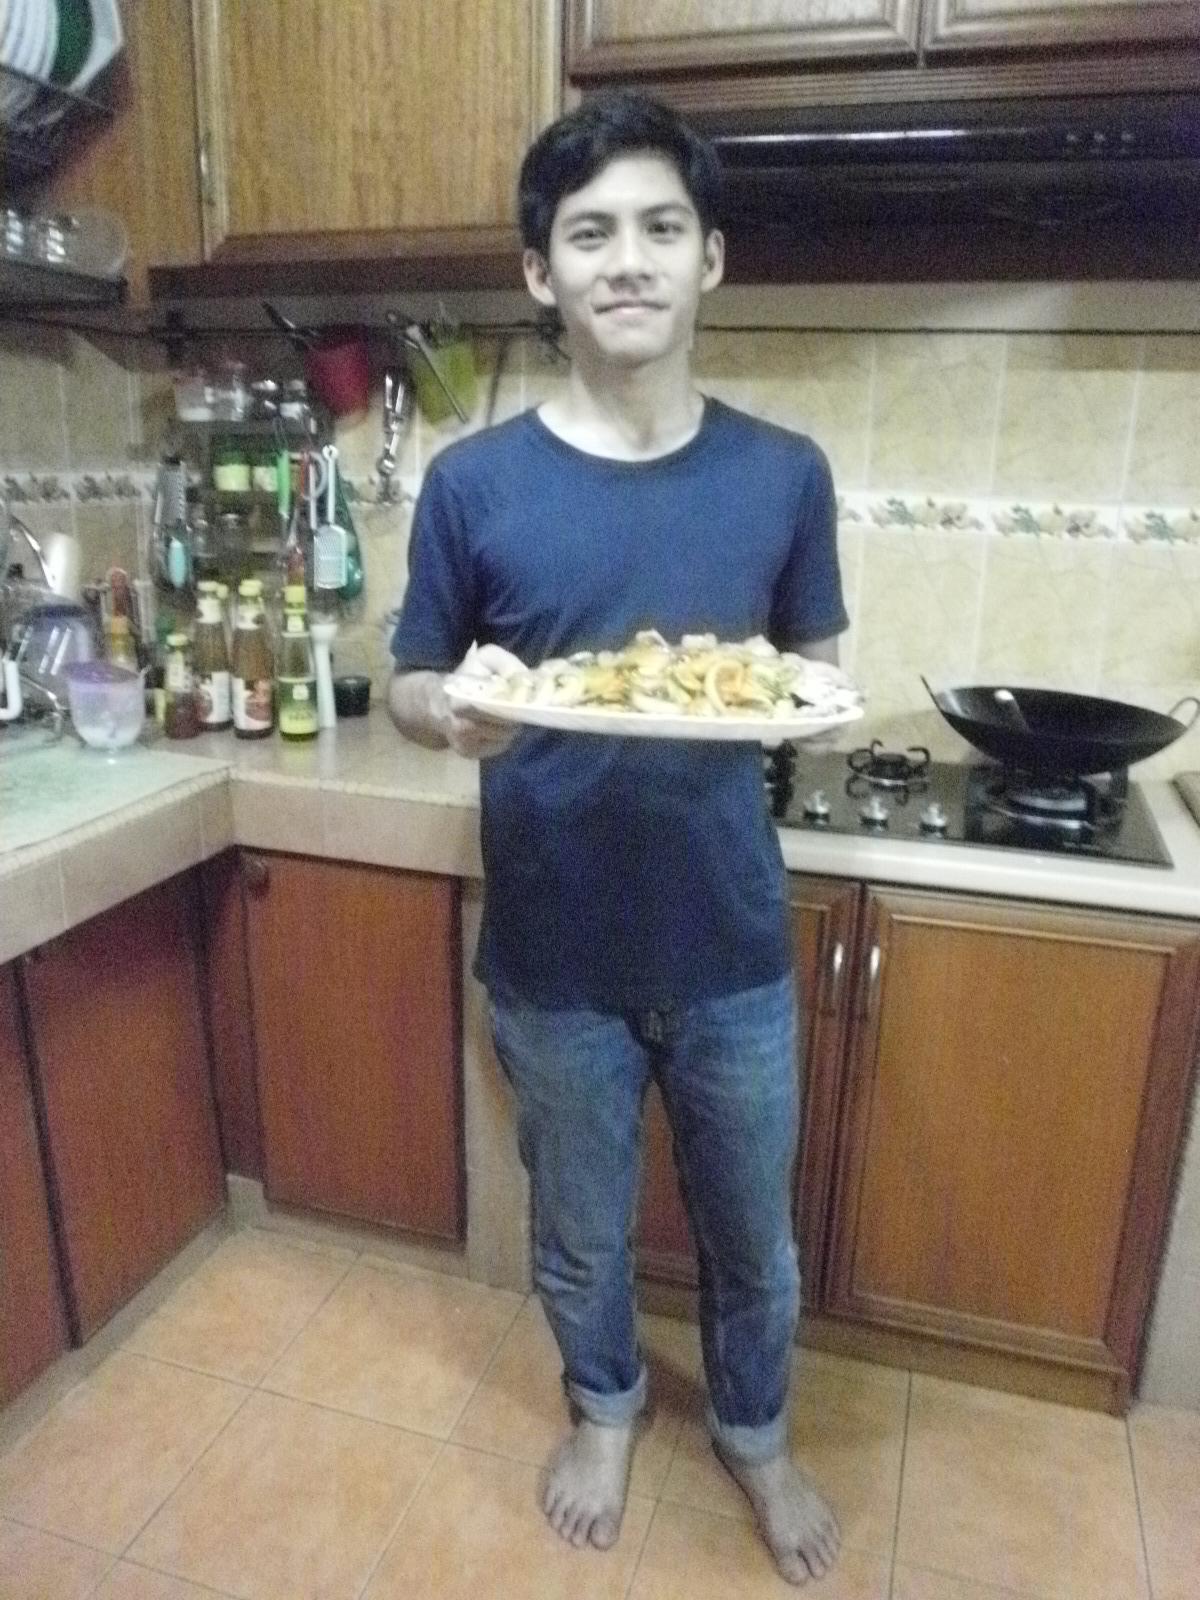 Bila Anak Bujang Masuk Dapur